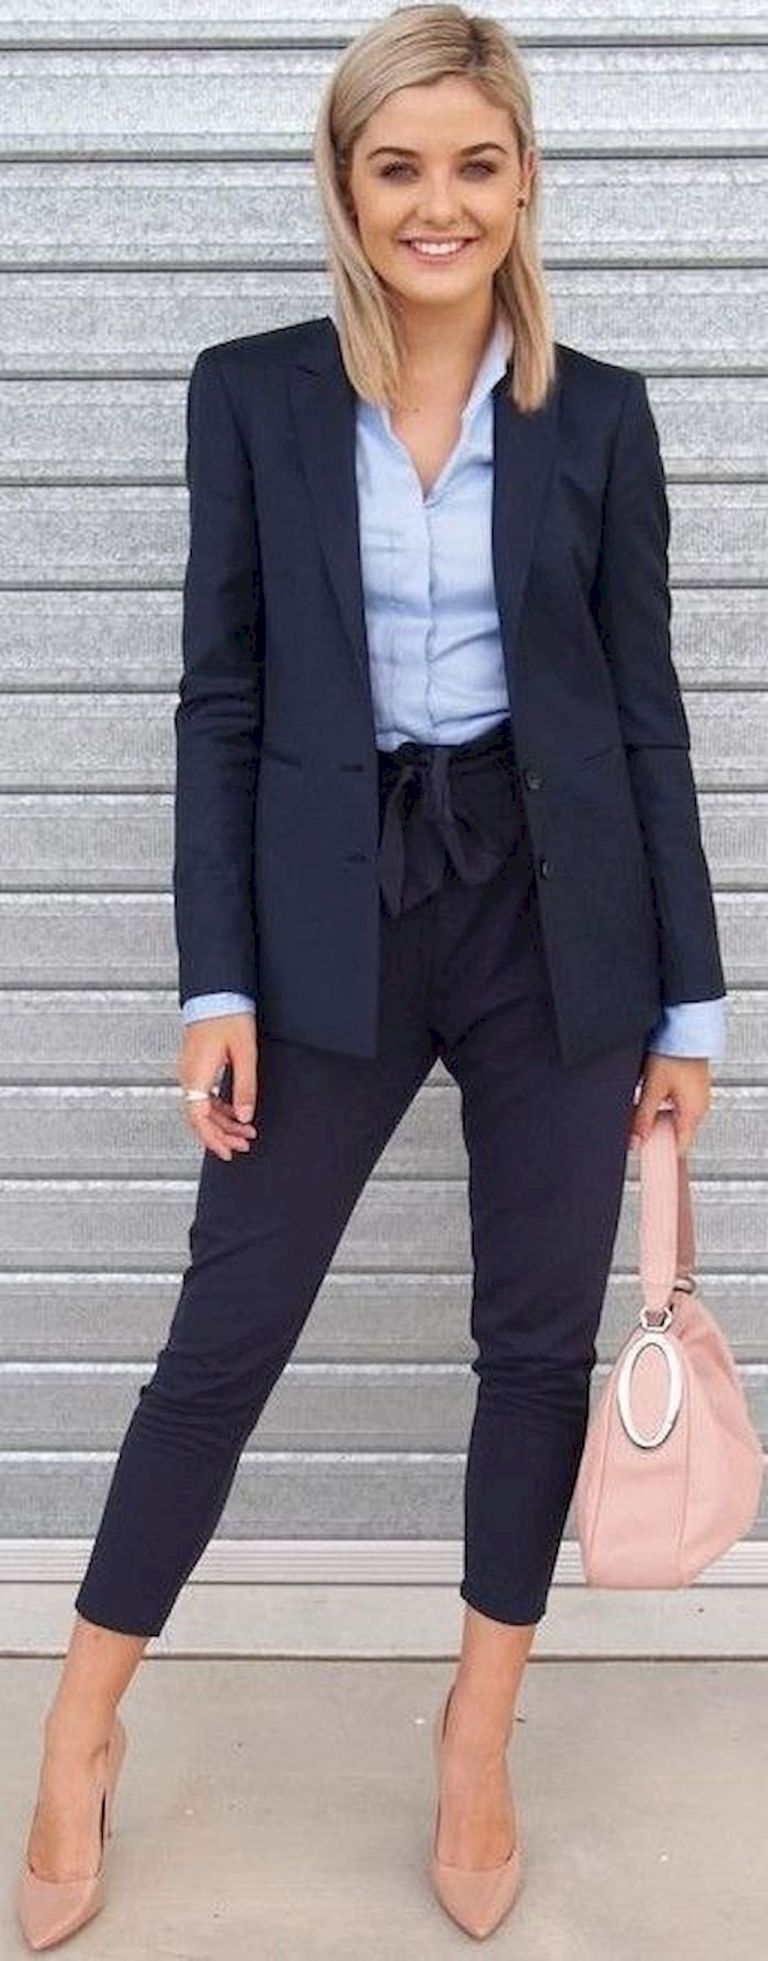 26 Elegant Work Outfits Every Woman Should Own - Bellestilo.com #workoutfitswomen